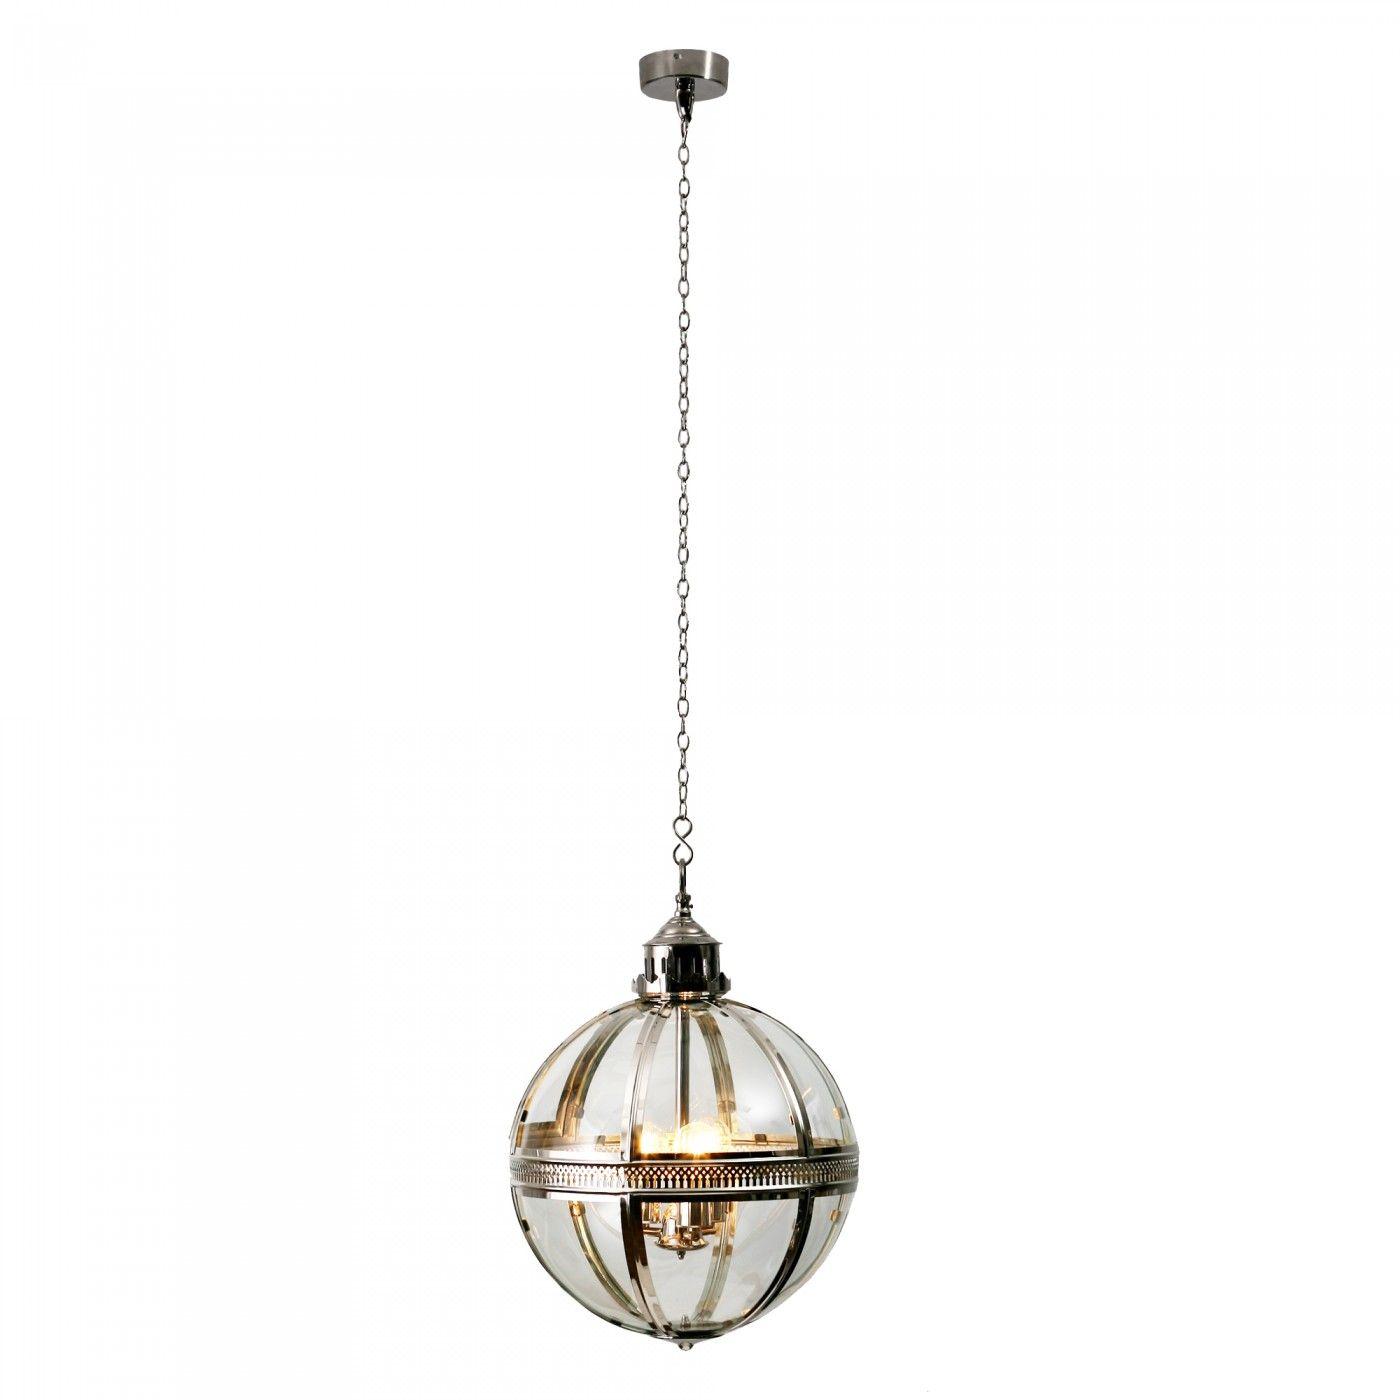 Orb Nickel Pendant - Ceiling Lights